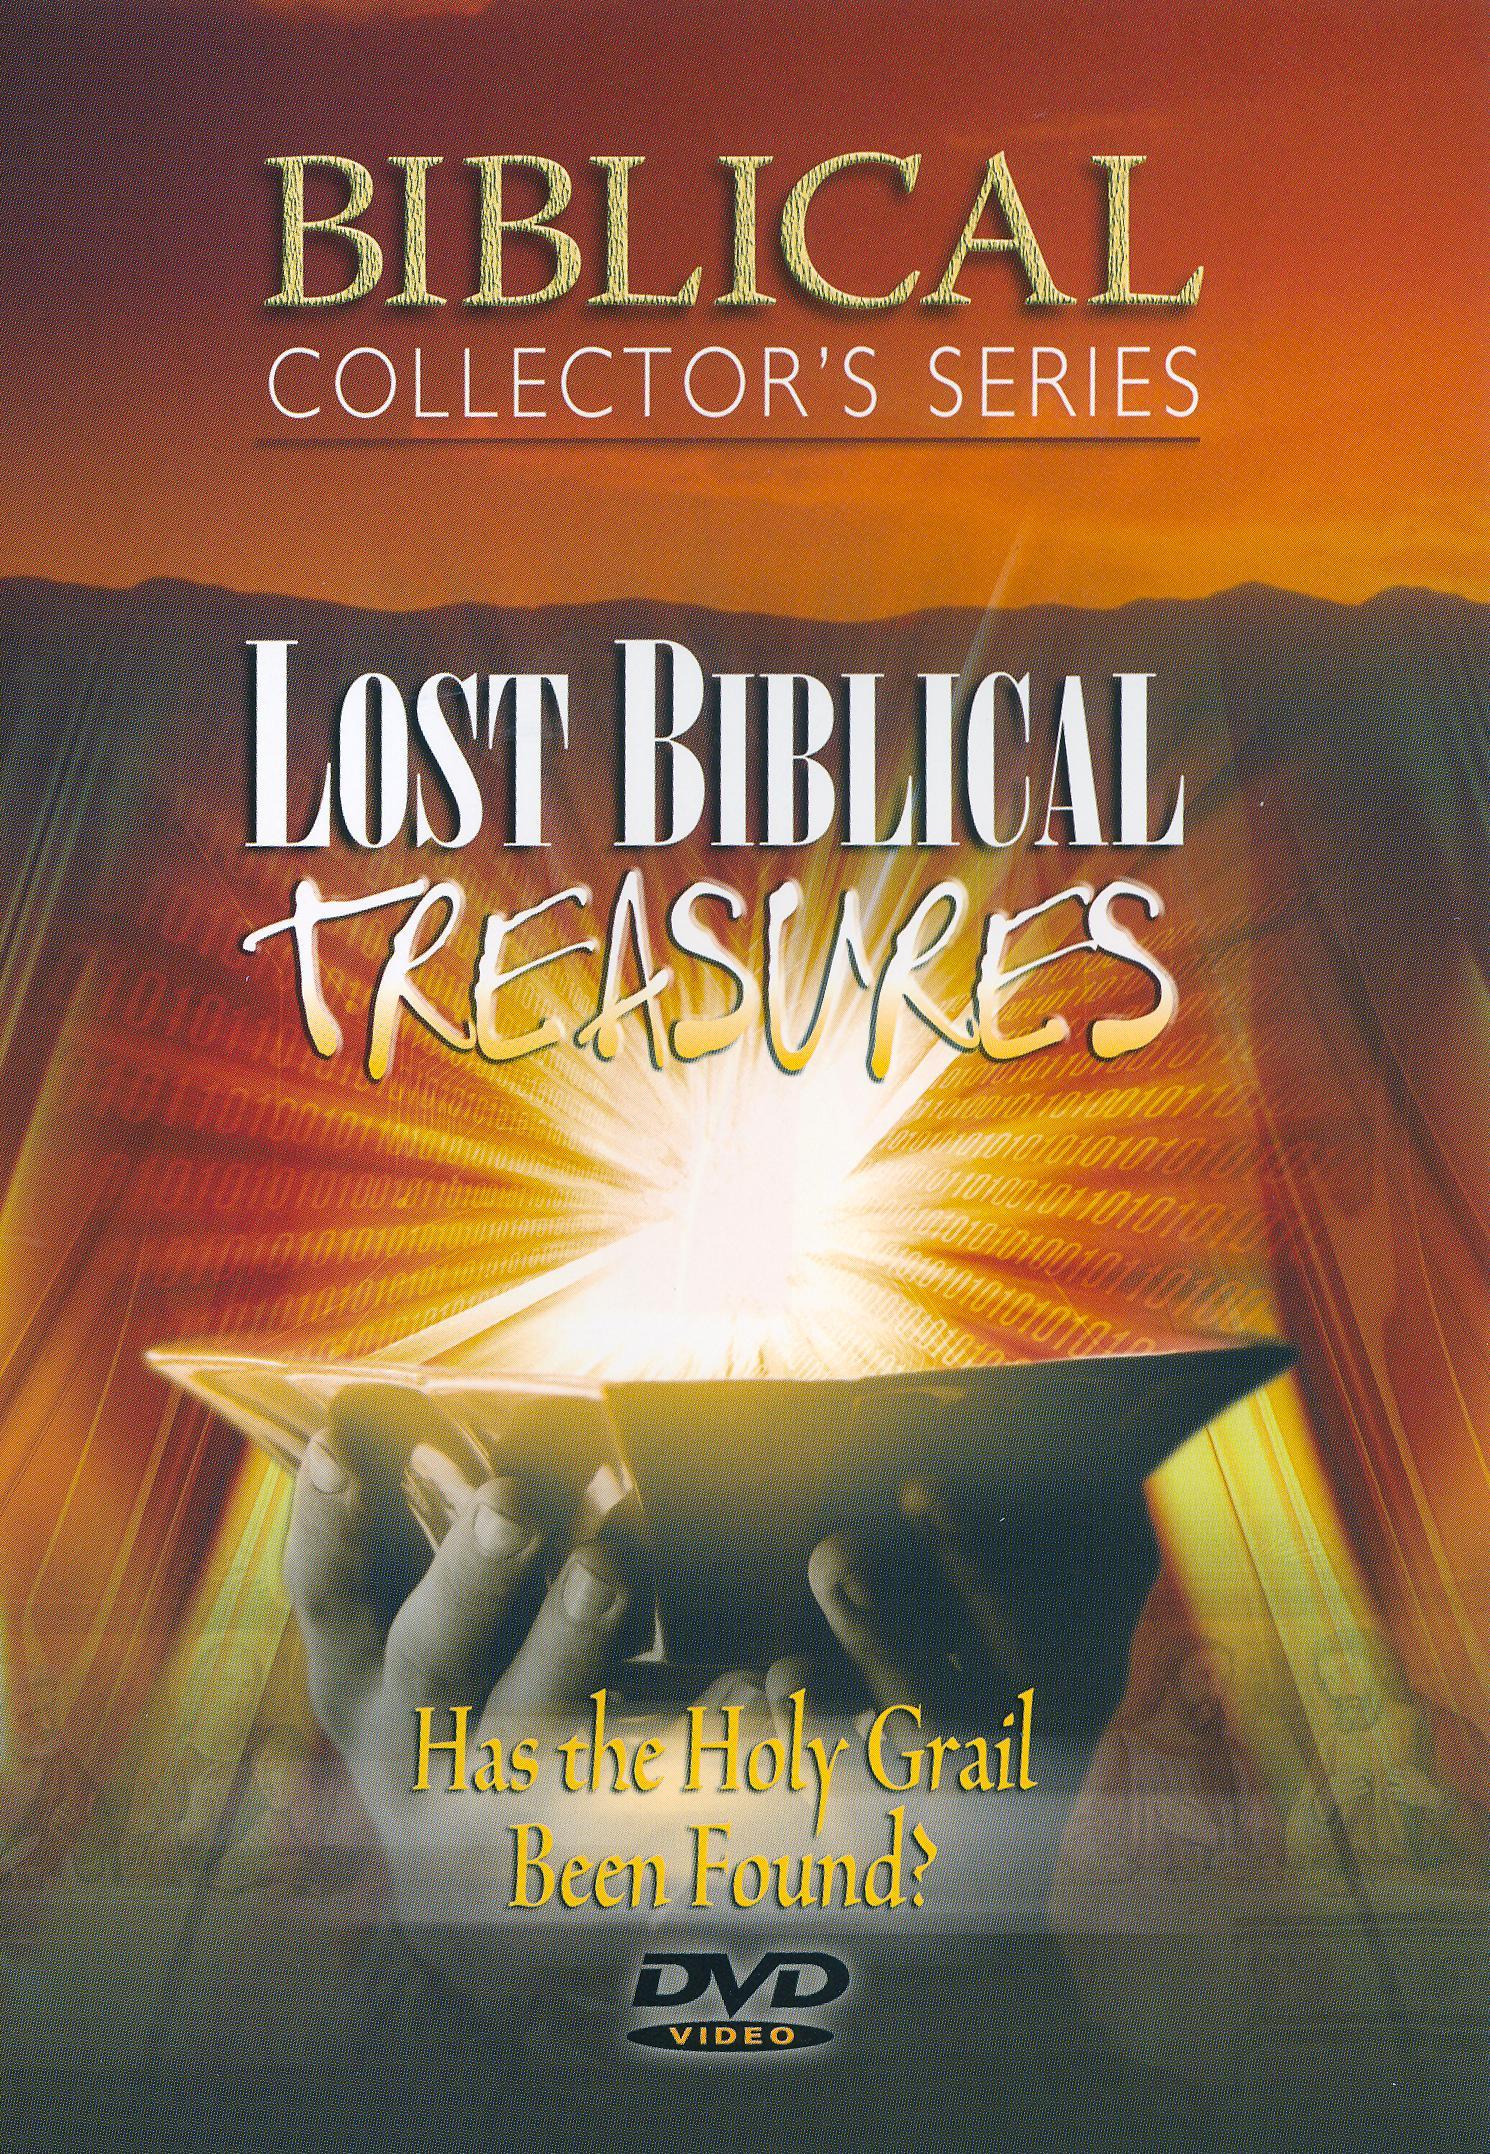 Biblical Collector's Series: Lost Biblical Treasures